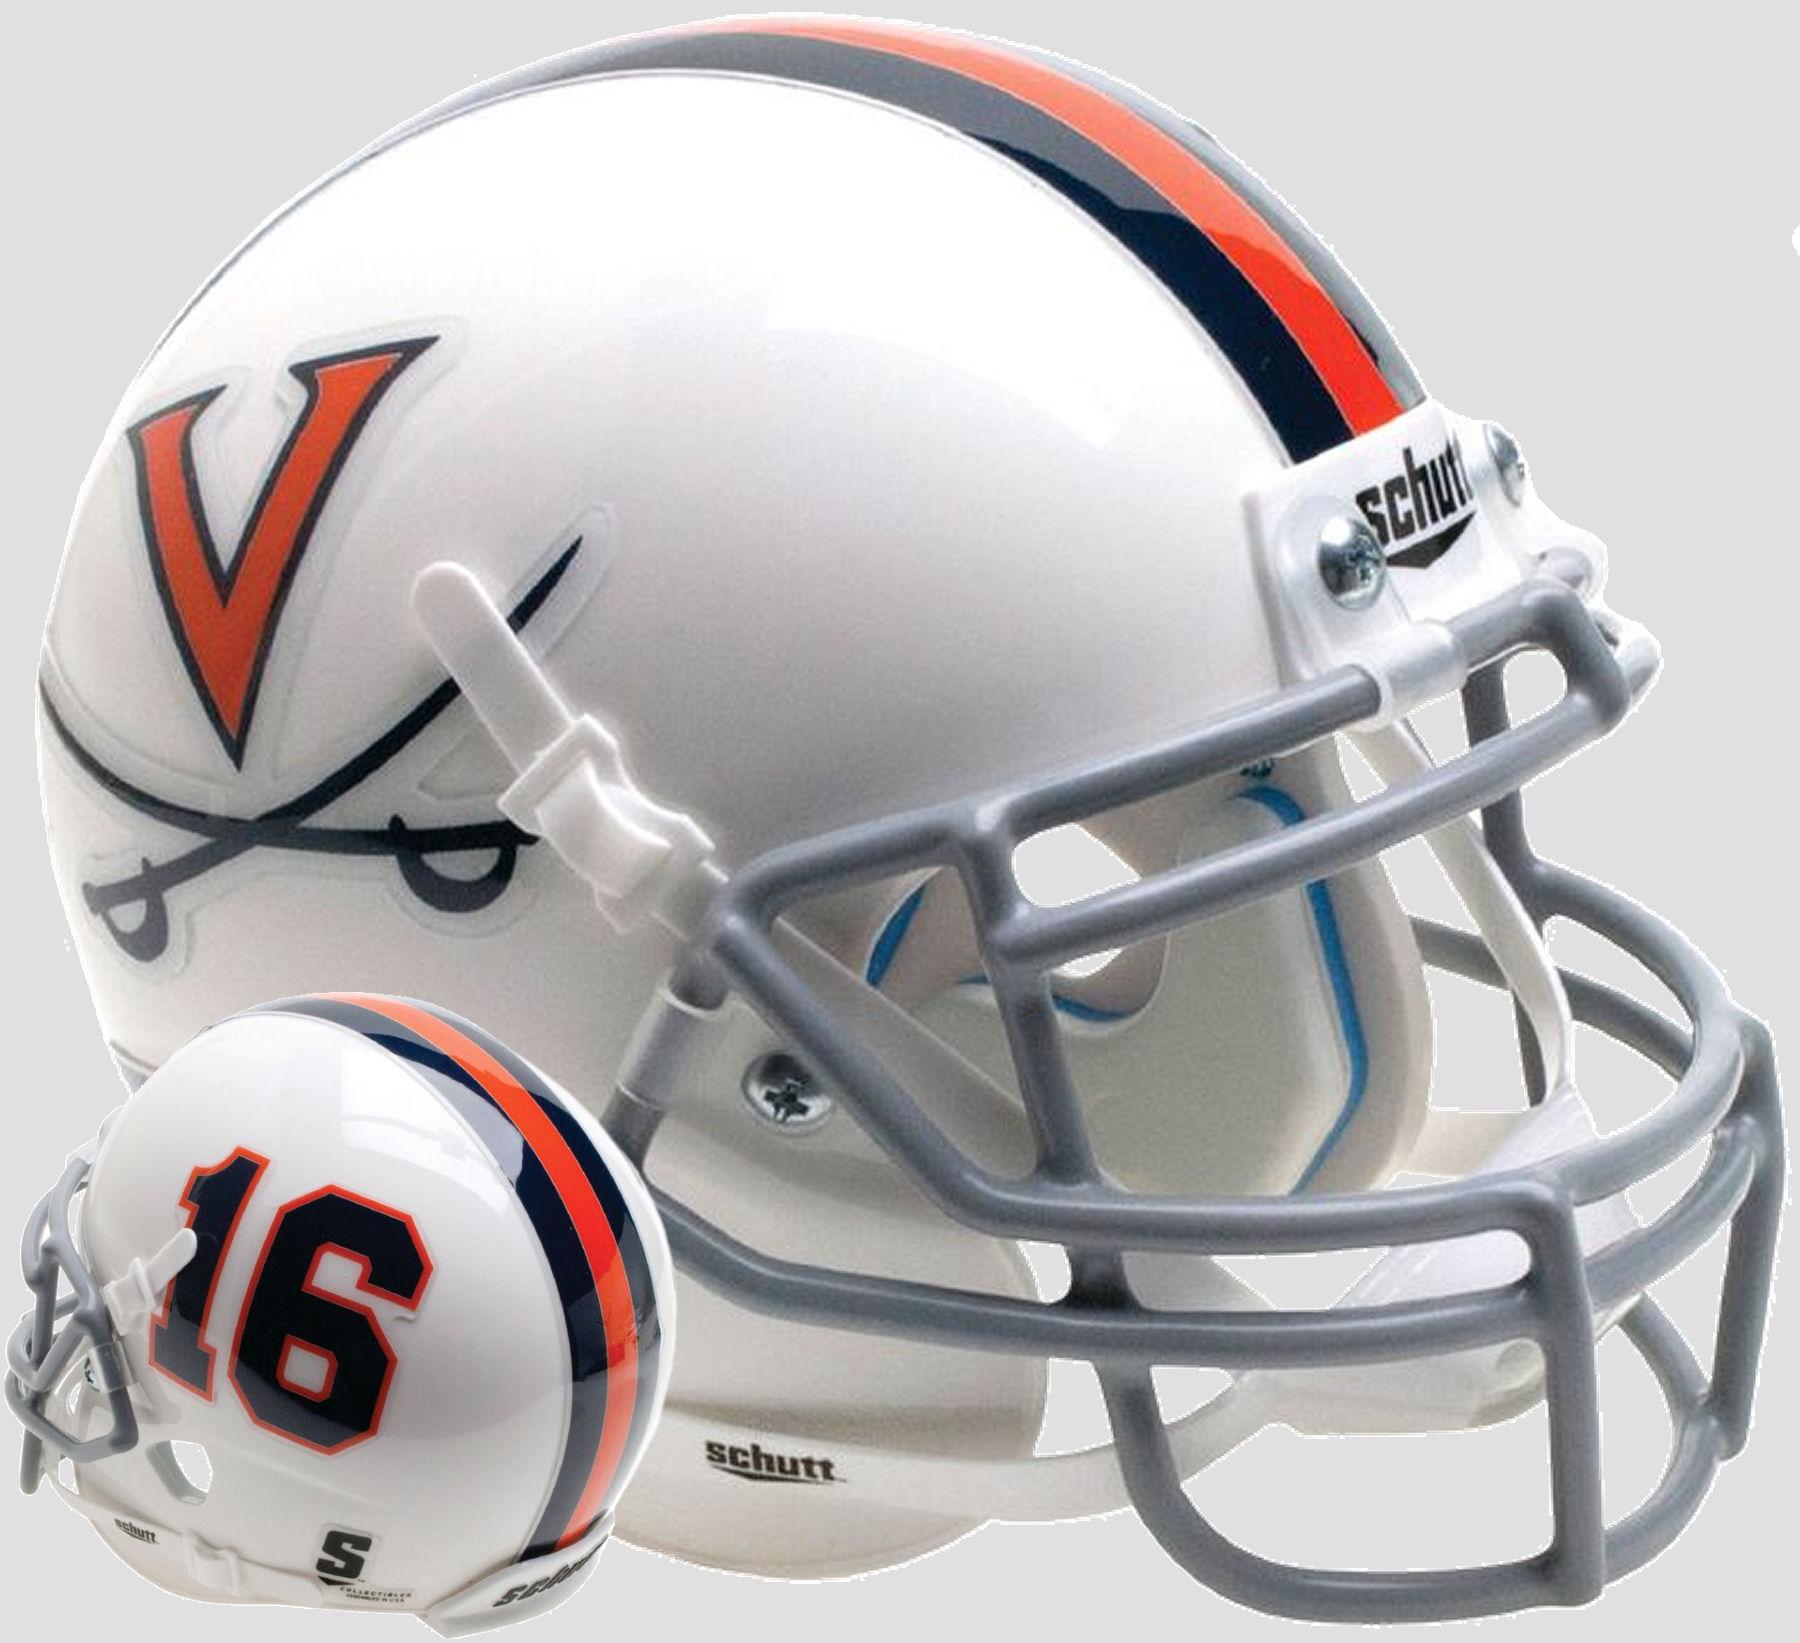 Virginia Cavaliers Mini XP Authentic Helmet Schutt <B>White 16</B>